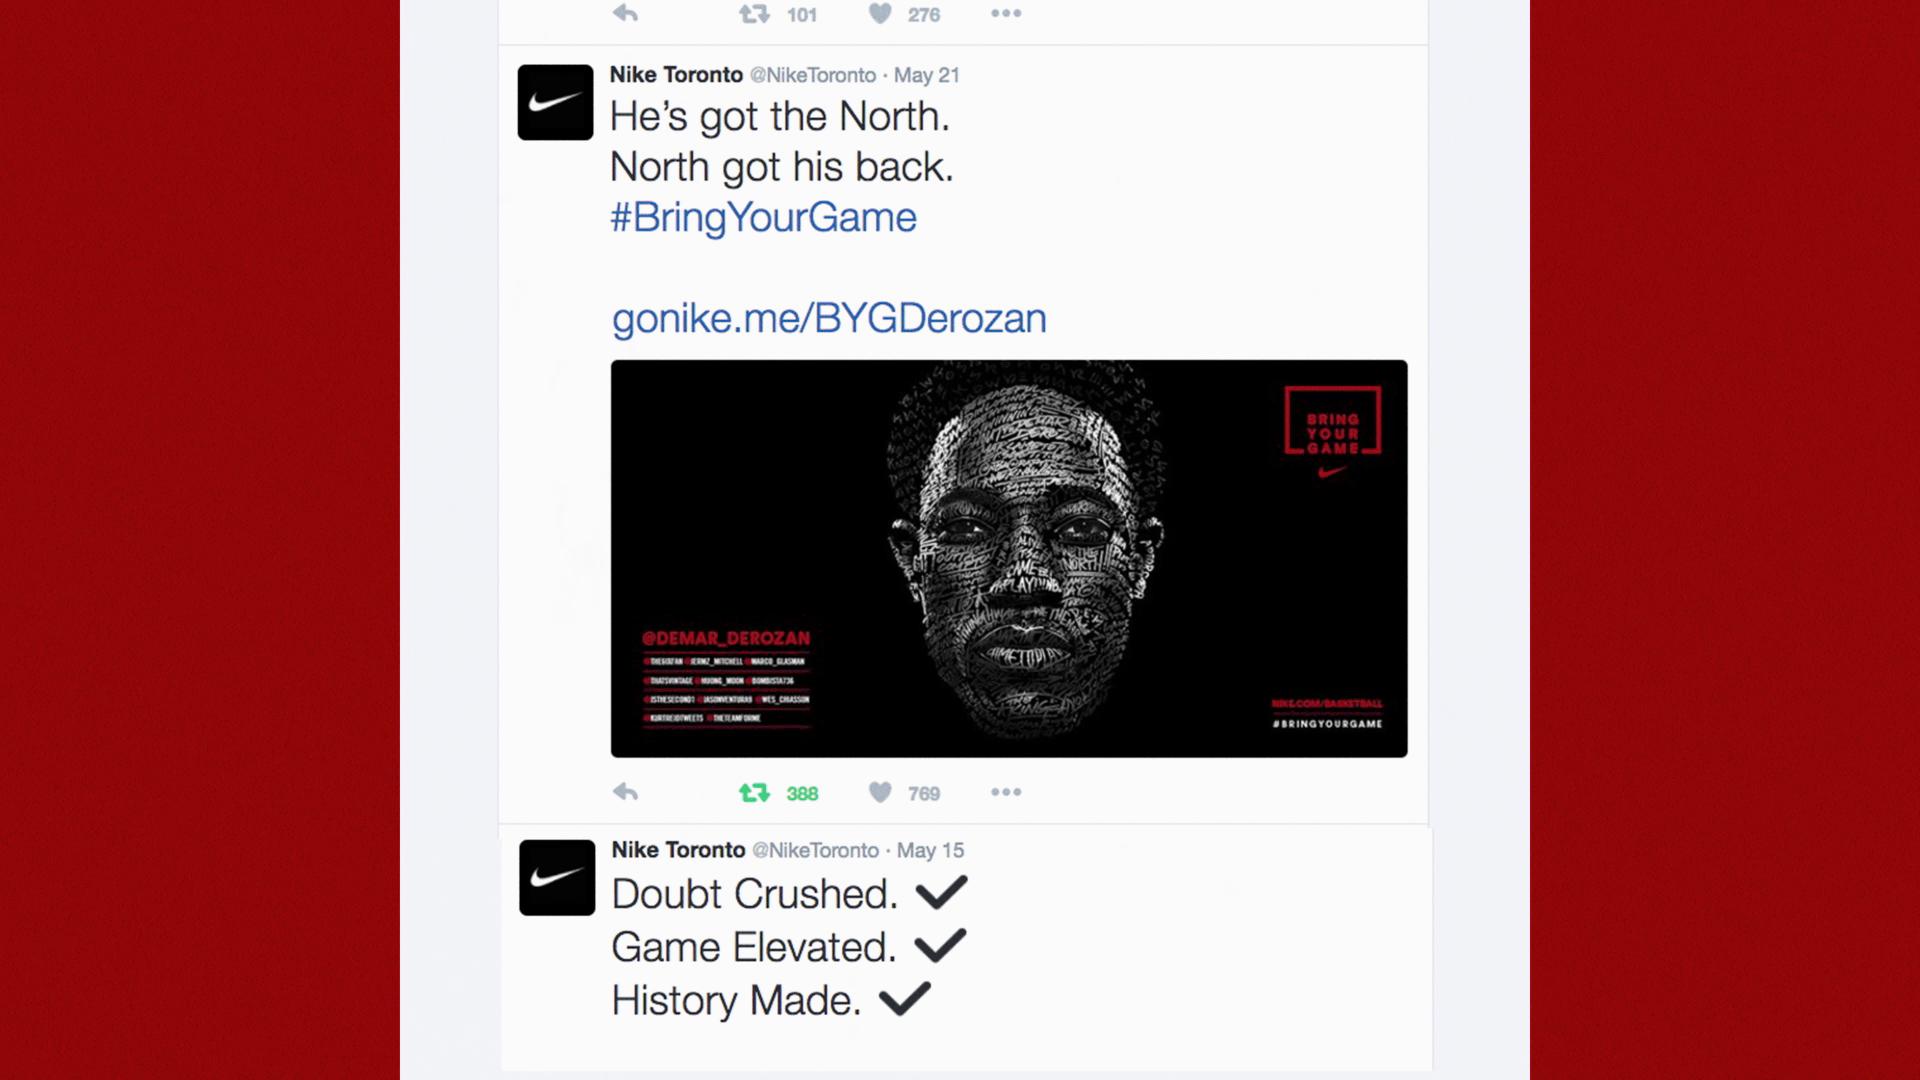 Thumbnail for Nike Face of the Fans - DeMar DeRozan